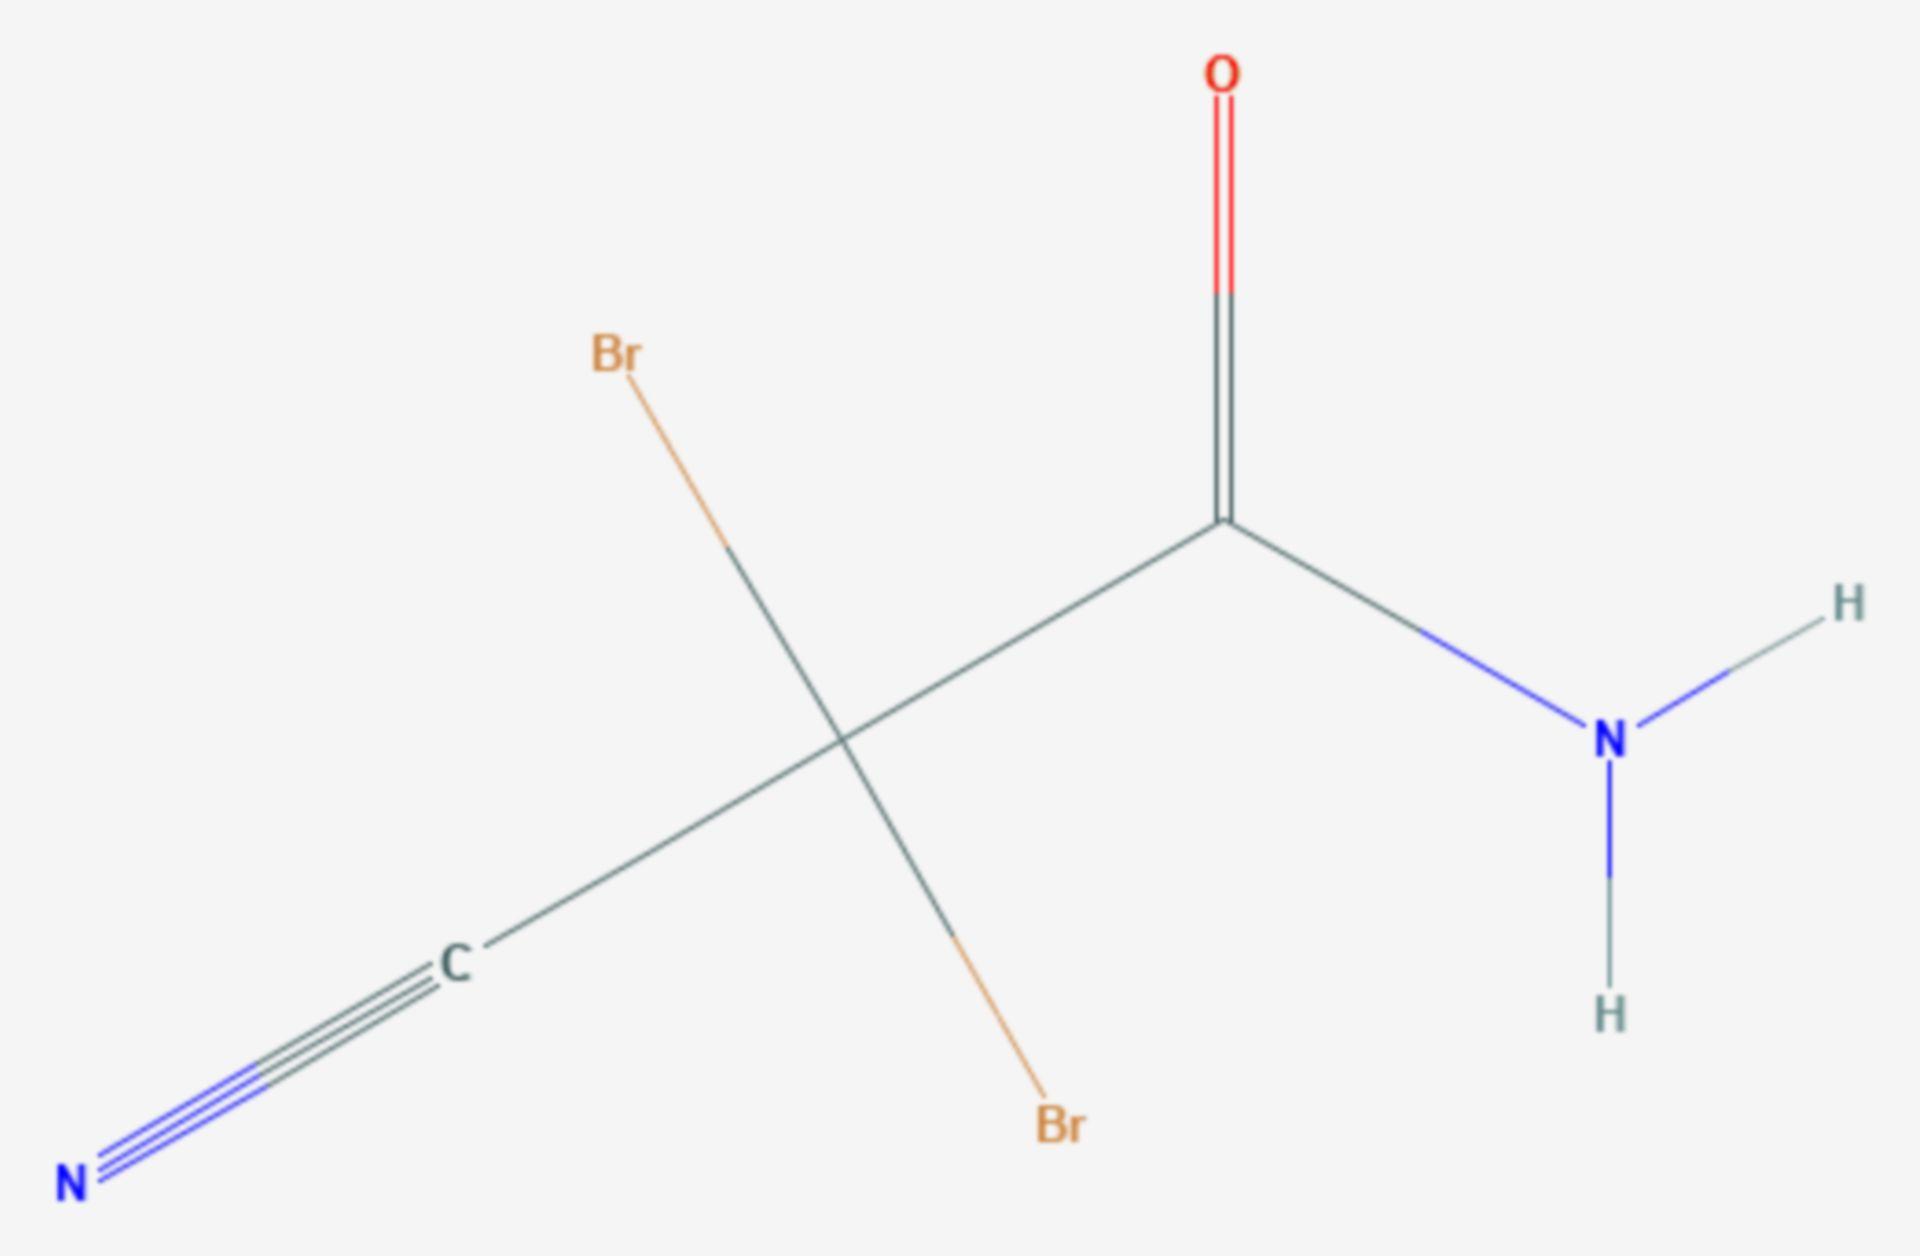 2,2-Dibrom-2-cyanacetamid (Strukturformel)